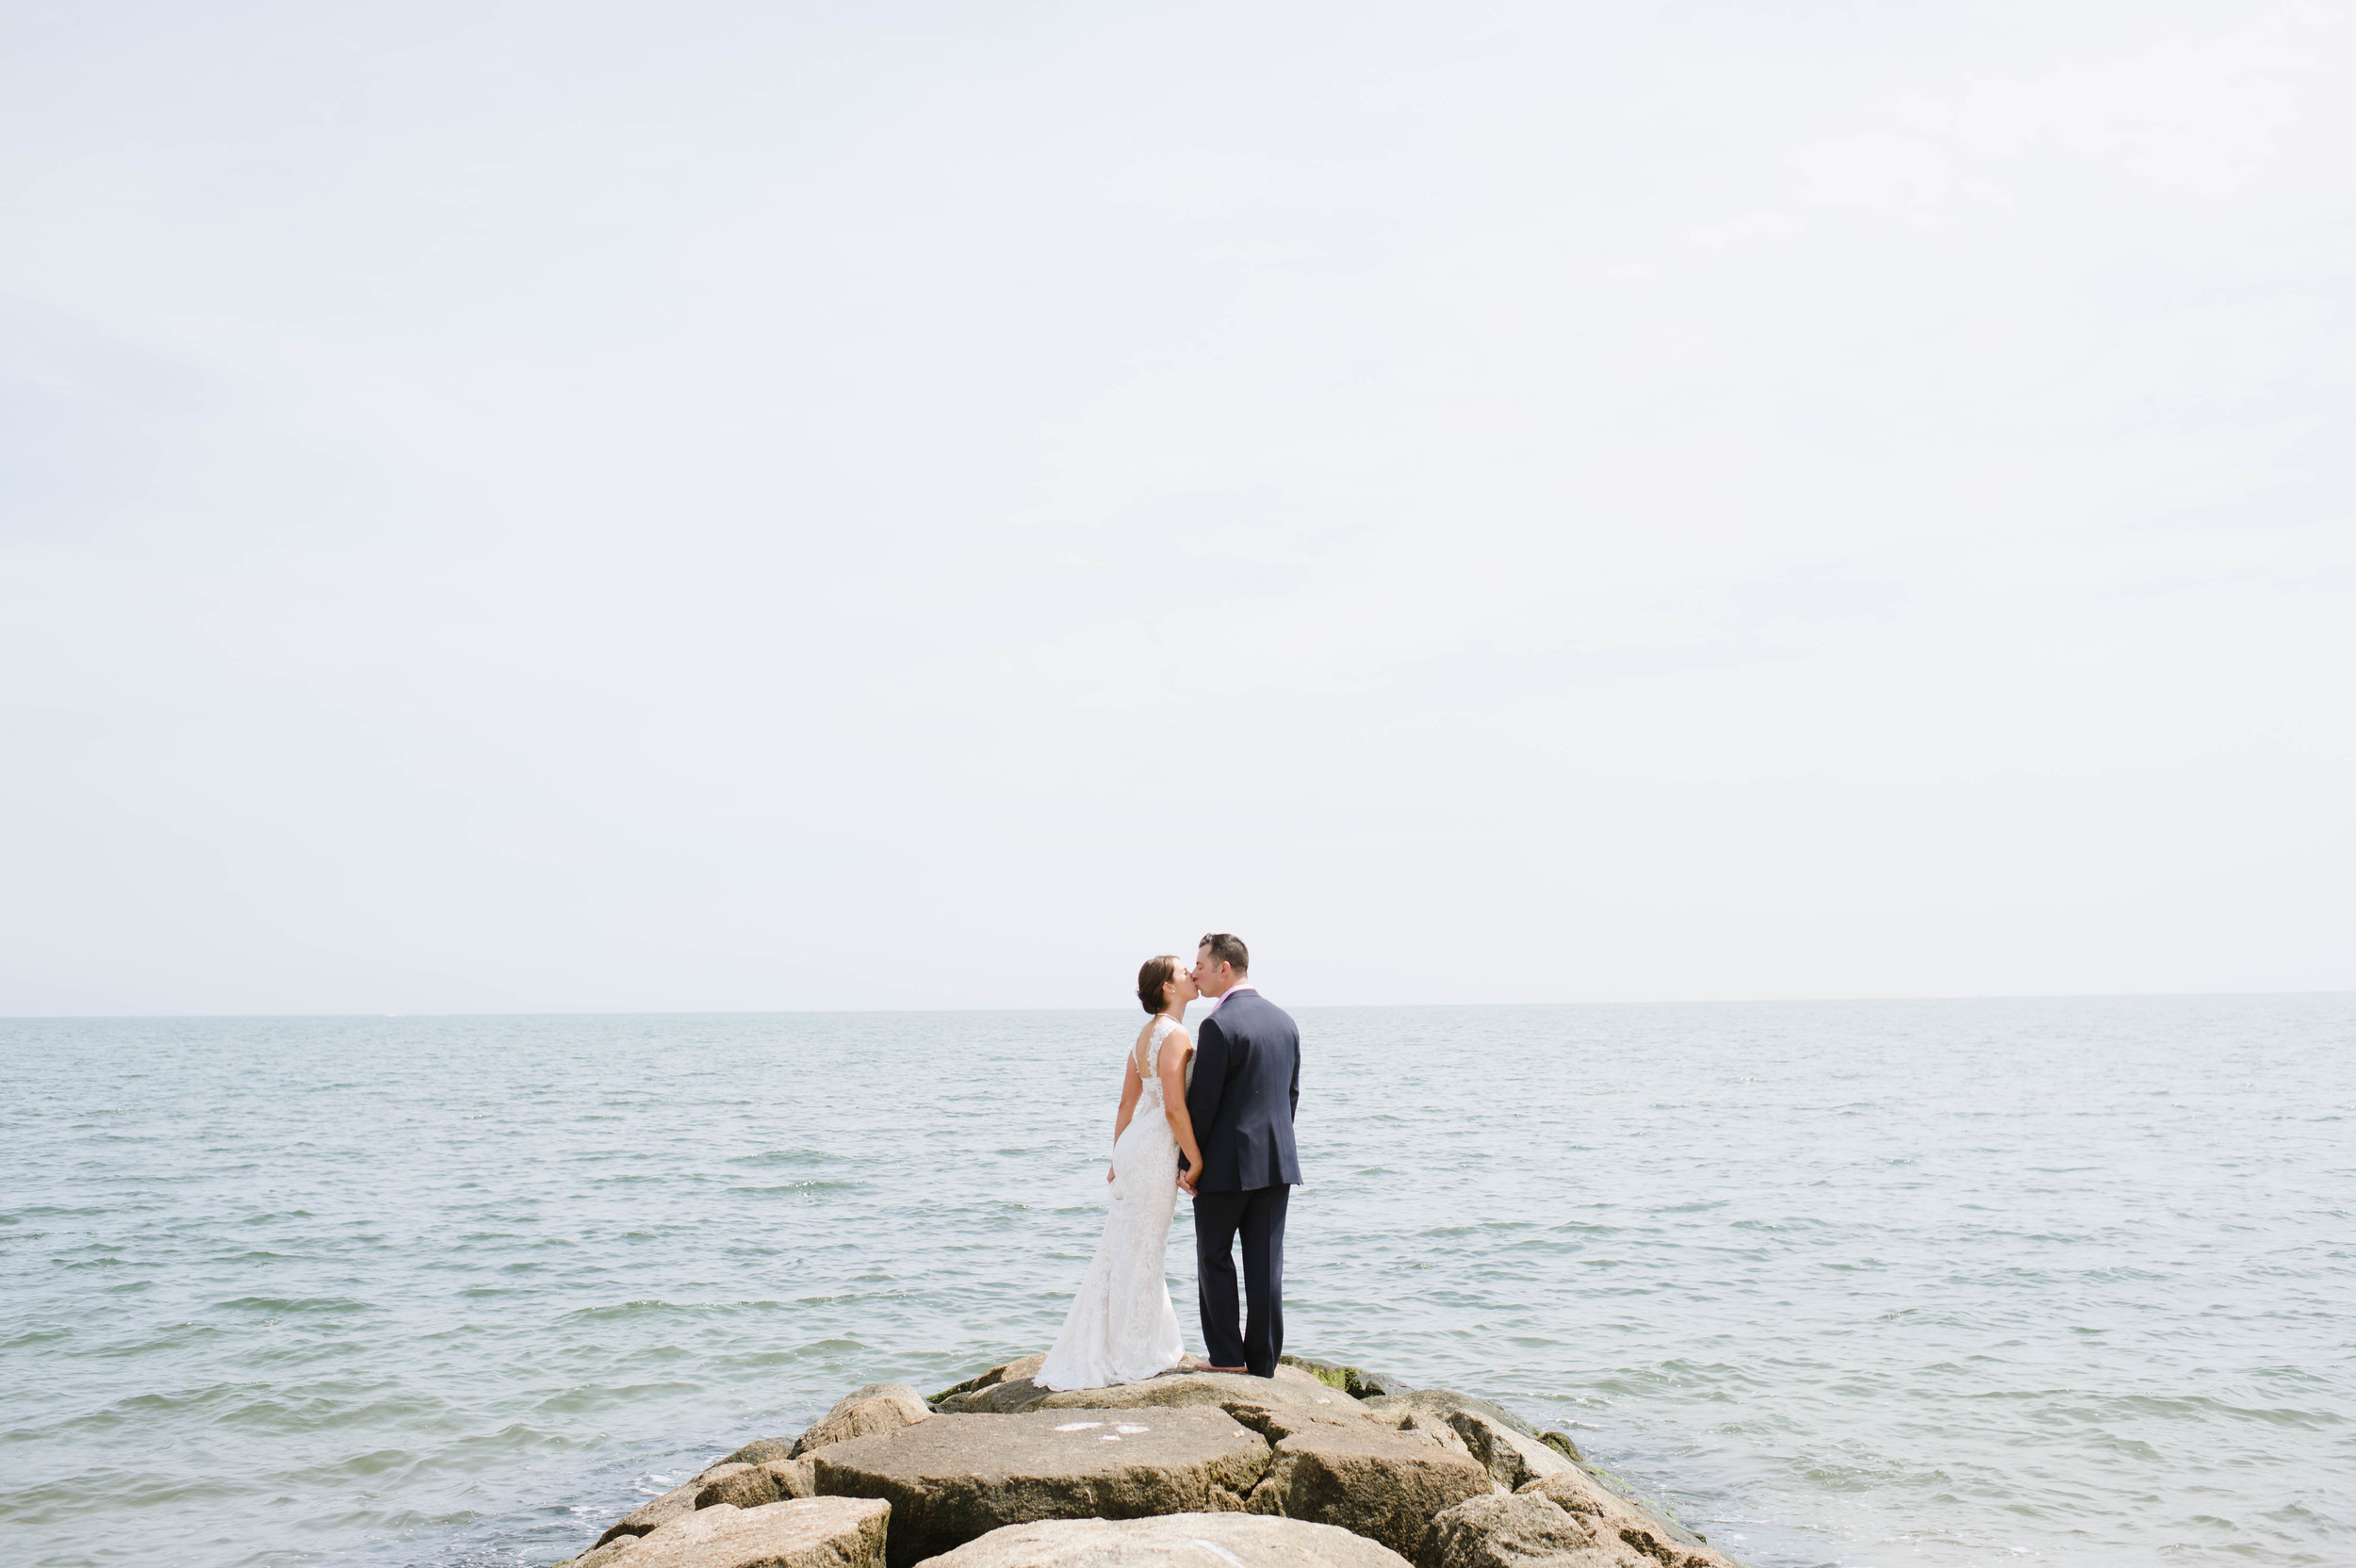 Creative_Wedding_Photography_Cape_Cod031.jpg